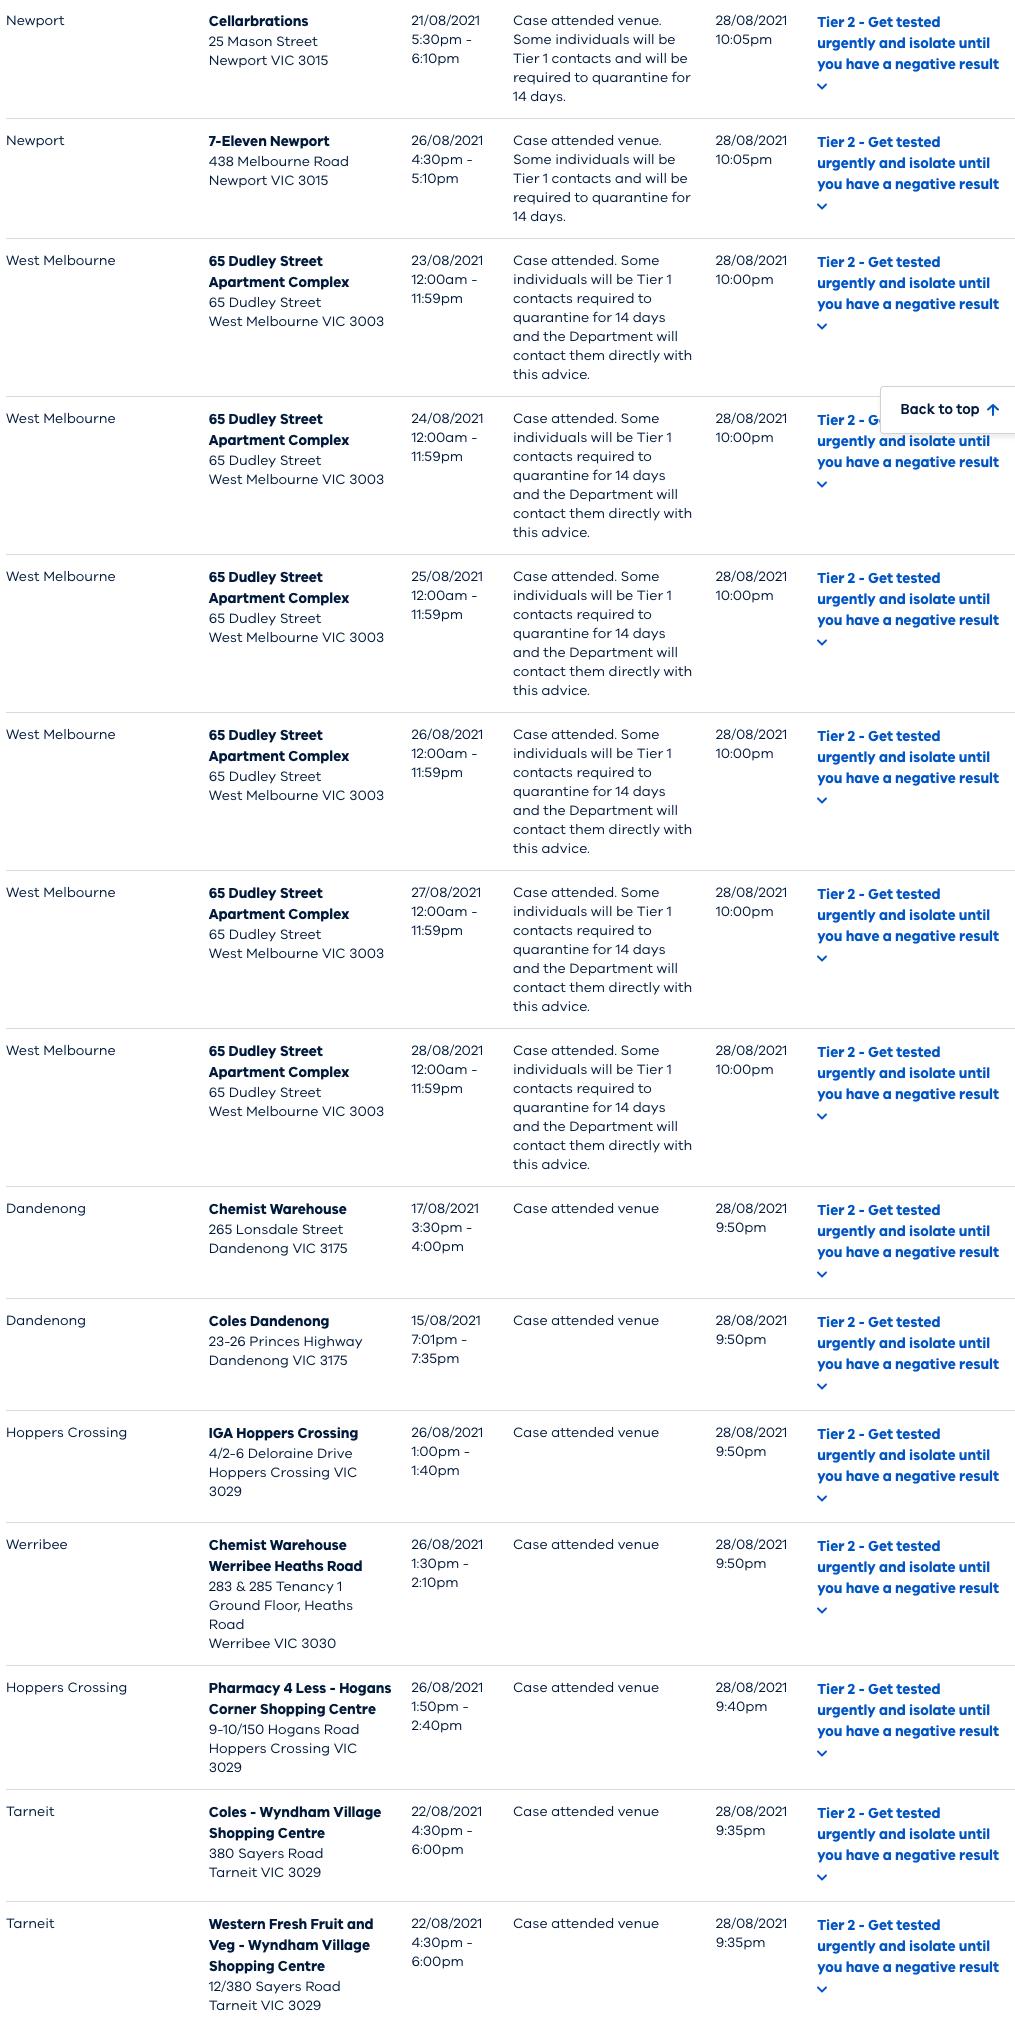 www.coronavirus.vic.gov.au_exposure-sites (17)的副本.png